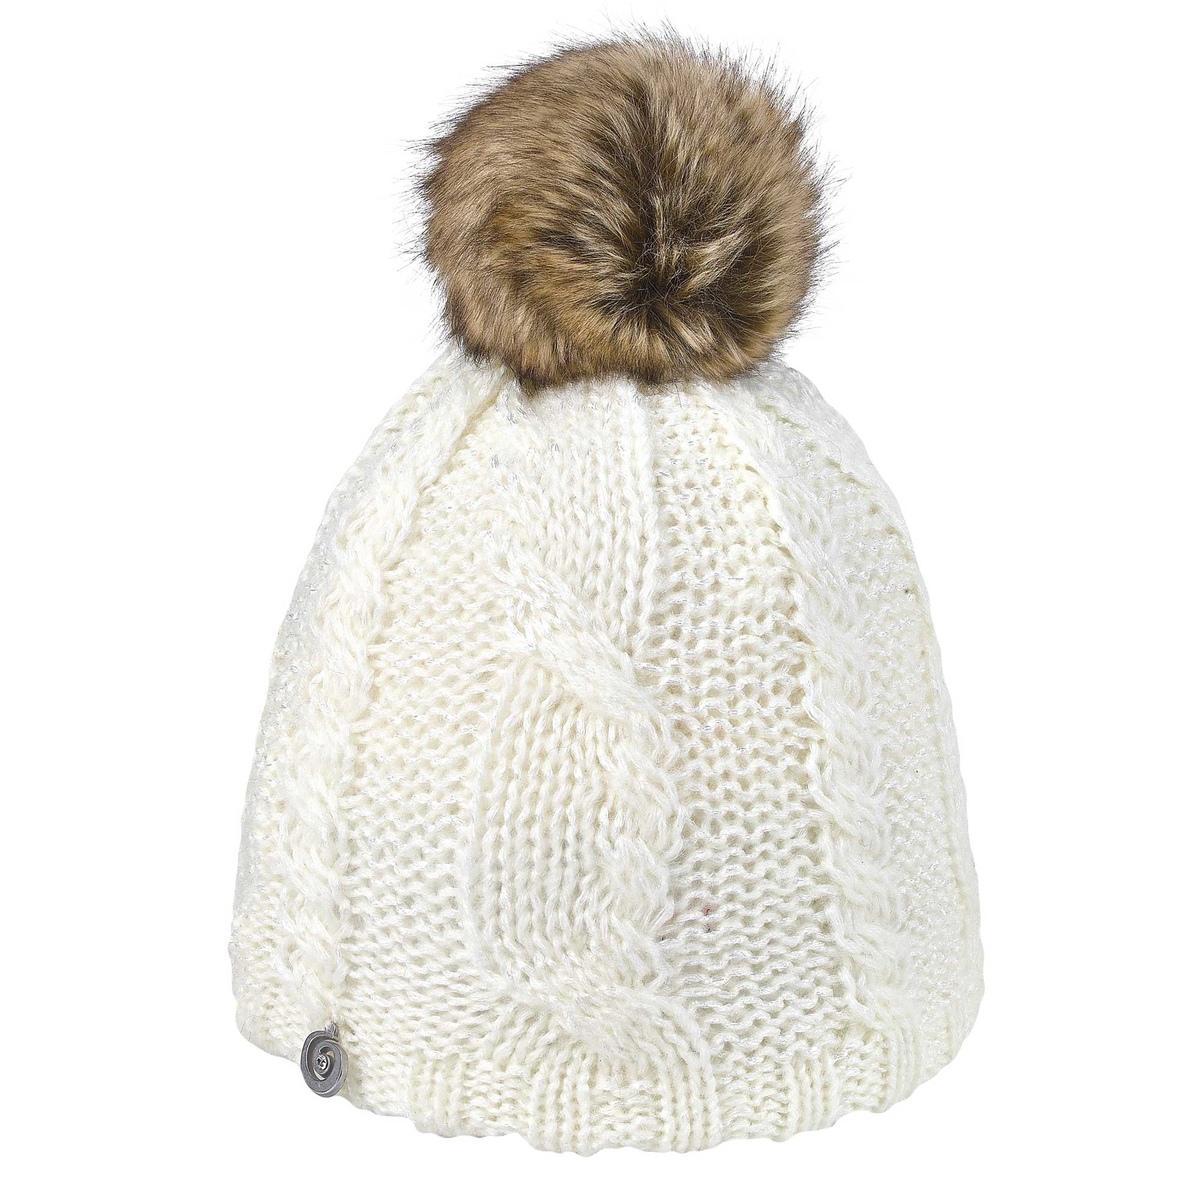 Brekka cappello Lurex donna crema - Confronta prezzi. ec8d4b4c6bd3